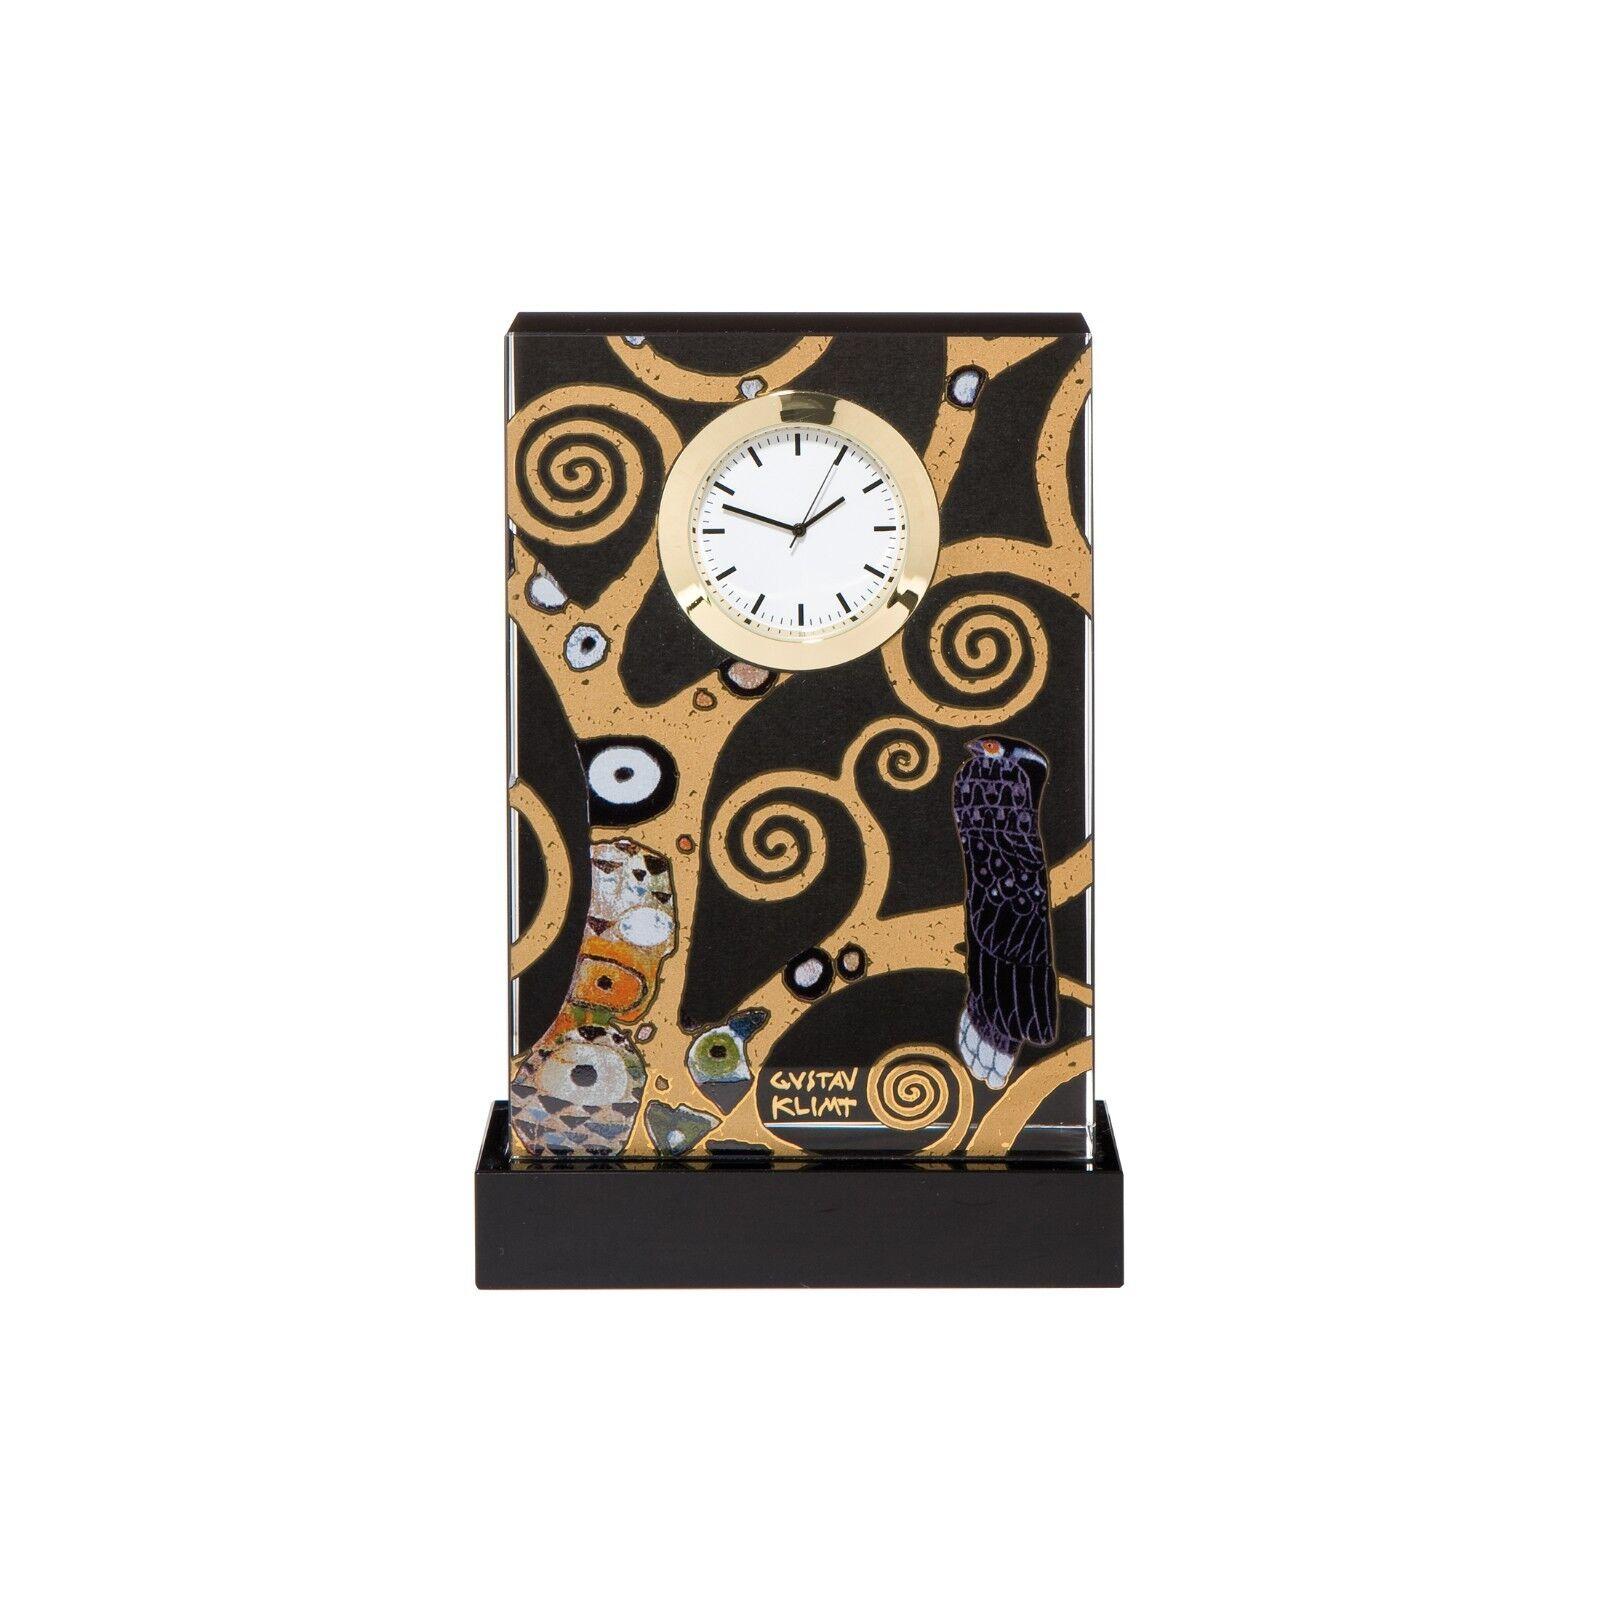 Goebel Thuya horloge pendule Nouveauté 2018 GUSTAV KLIMT artistes artistes artistes Coultre 0c8871